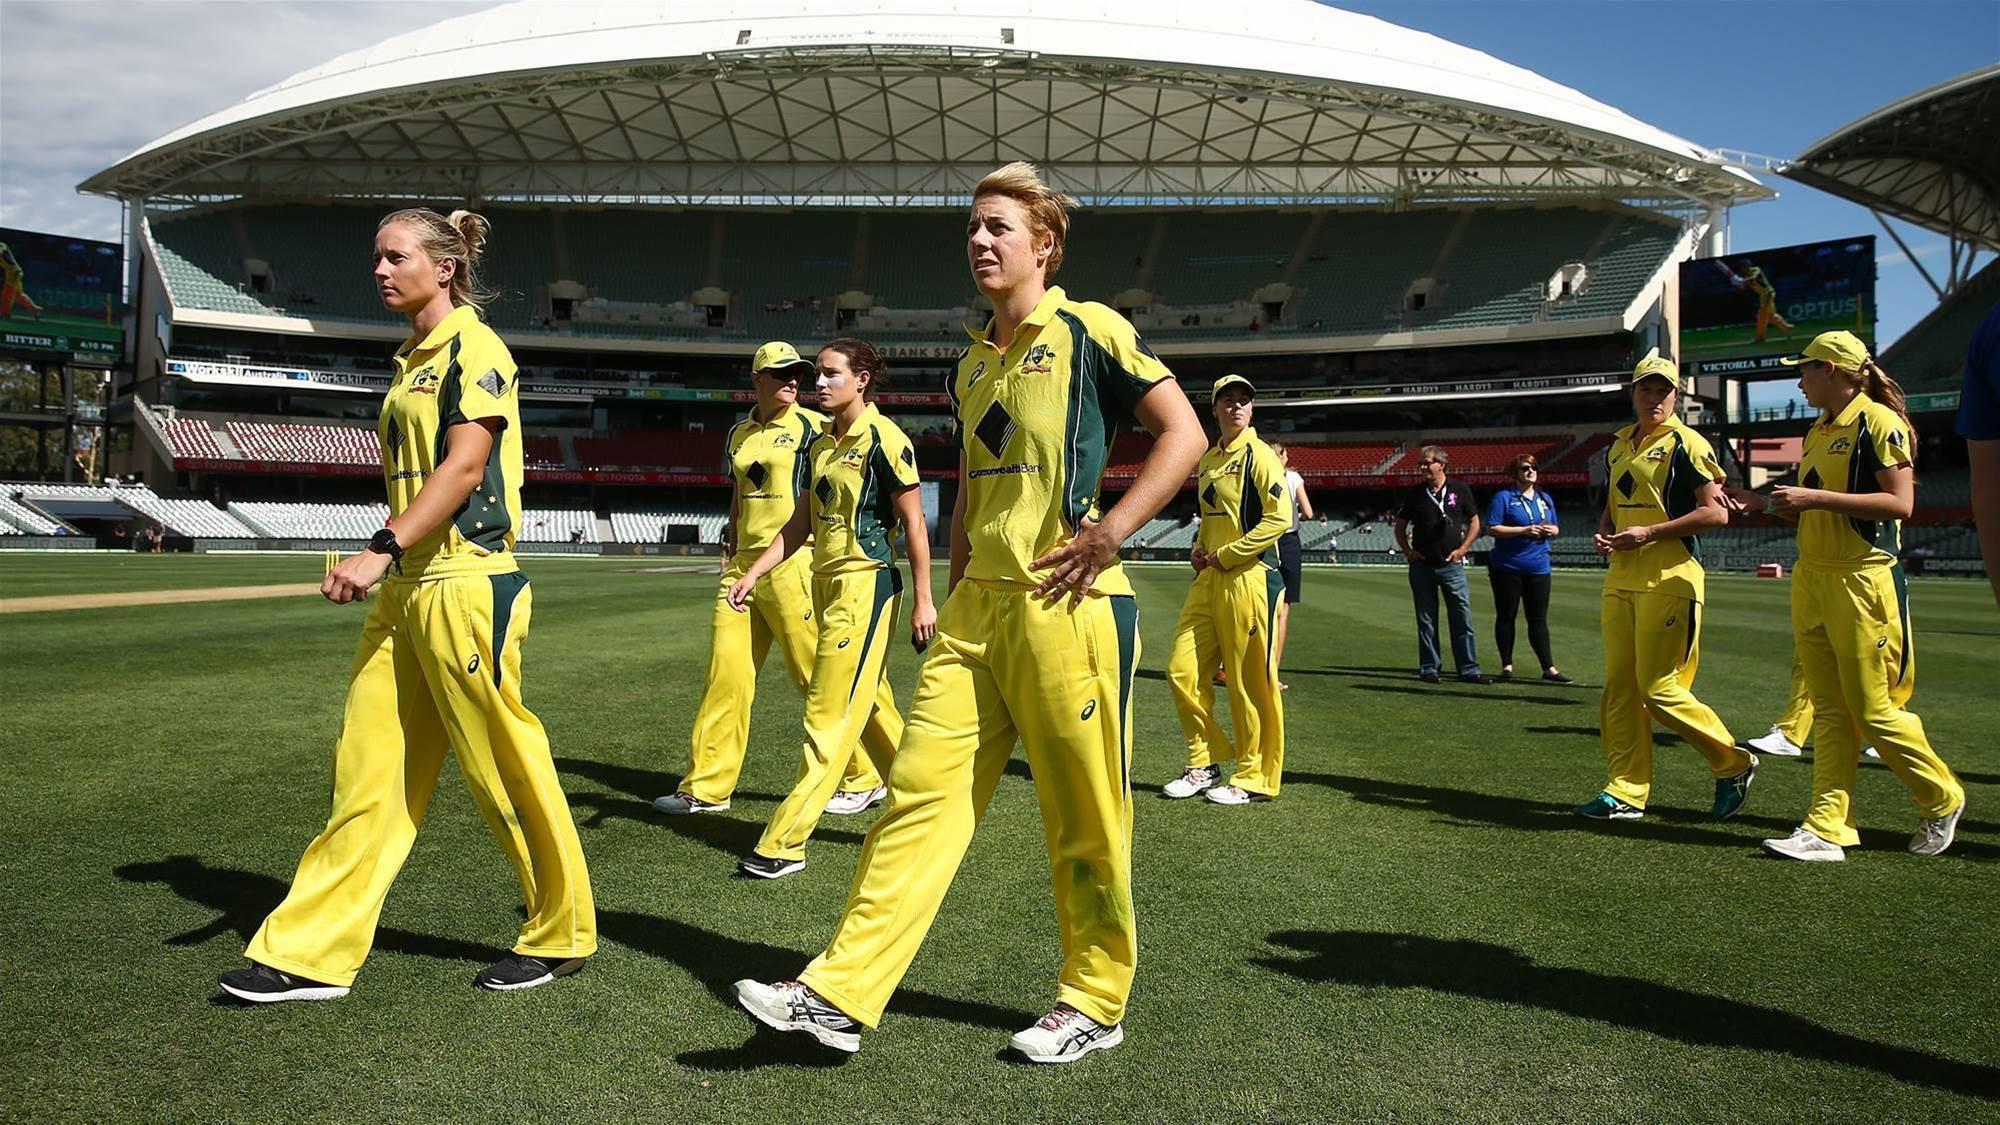 Australia suffer loss in final group match